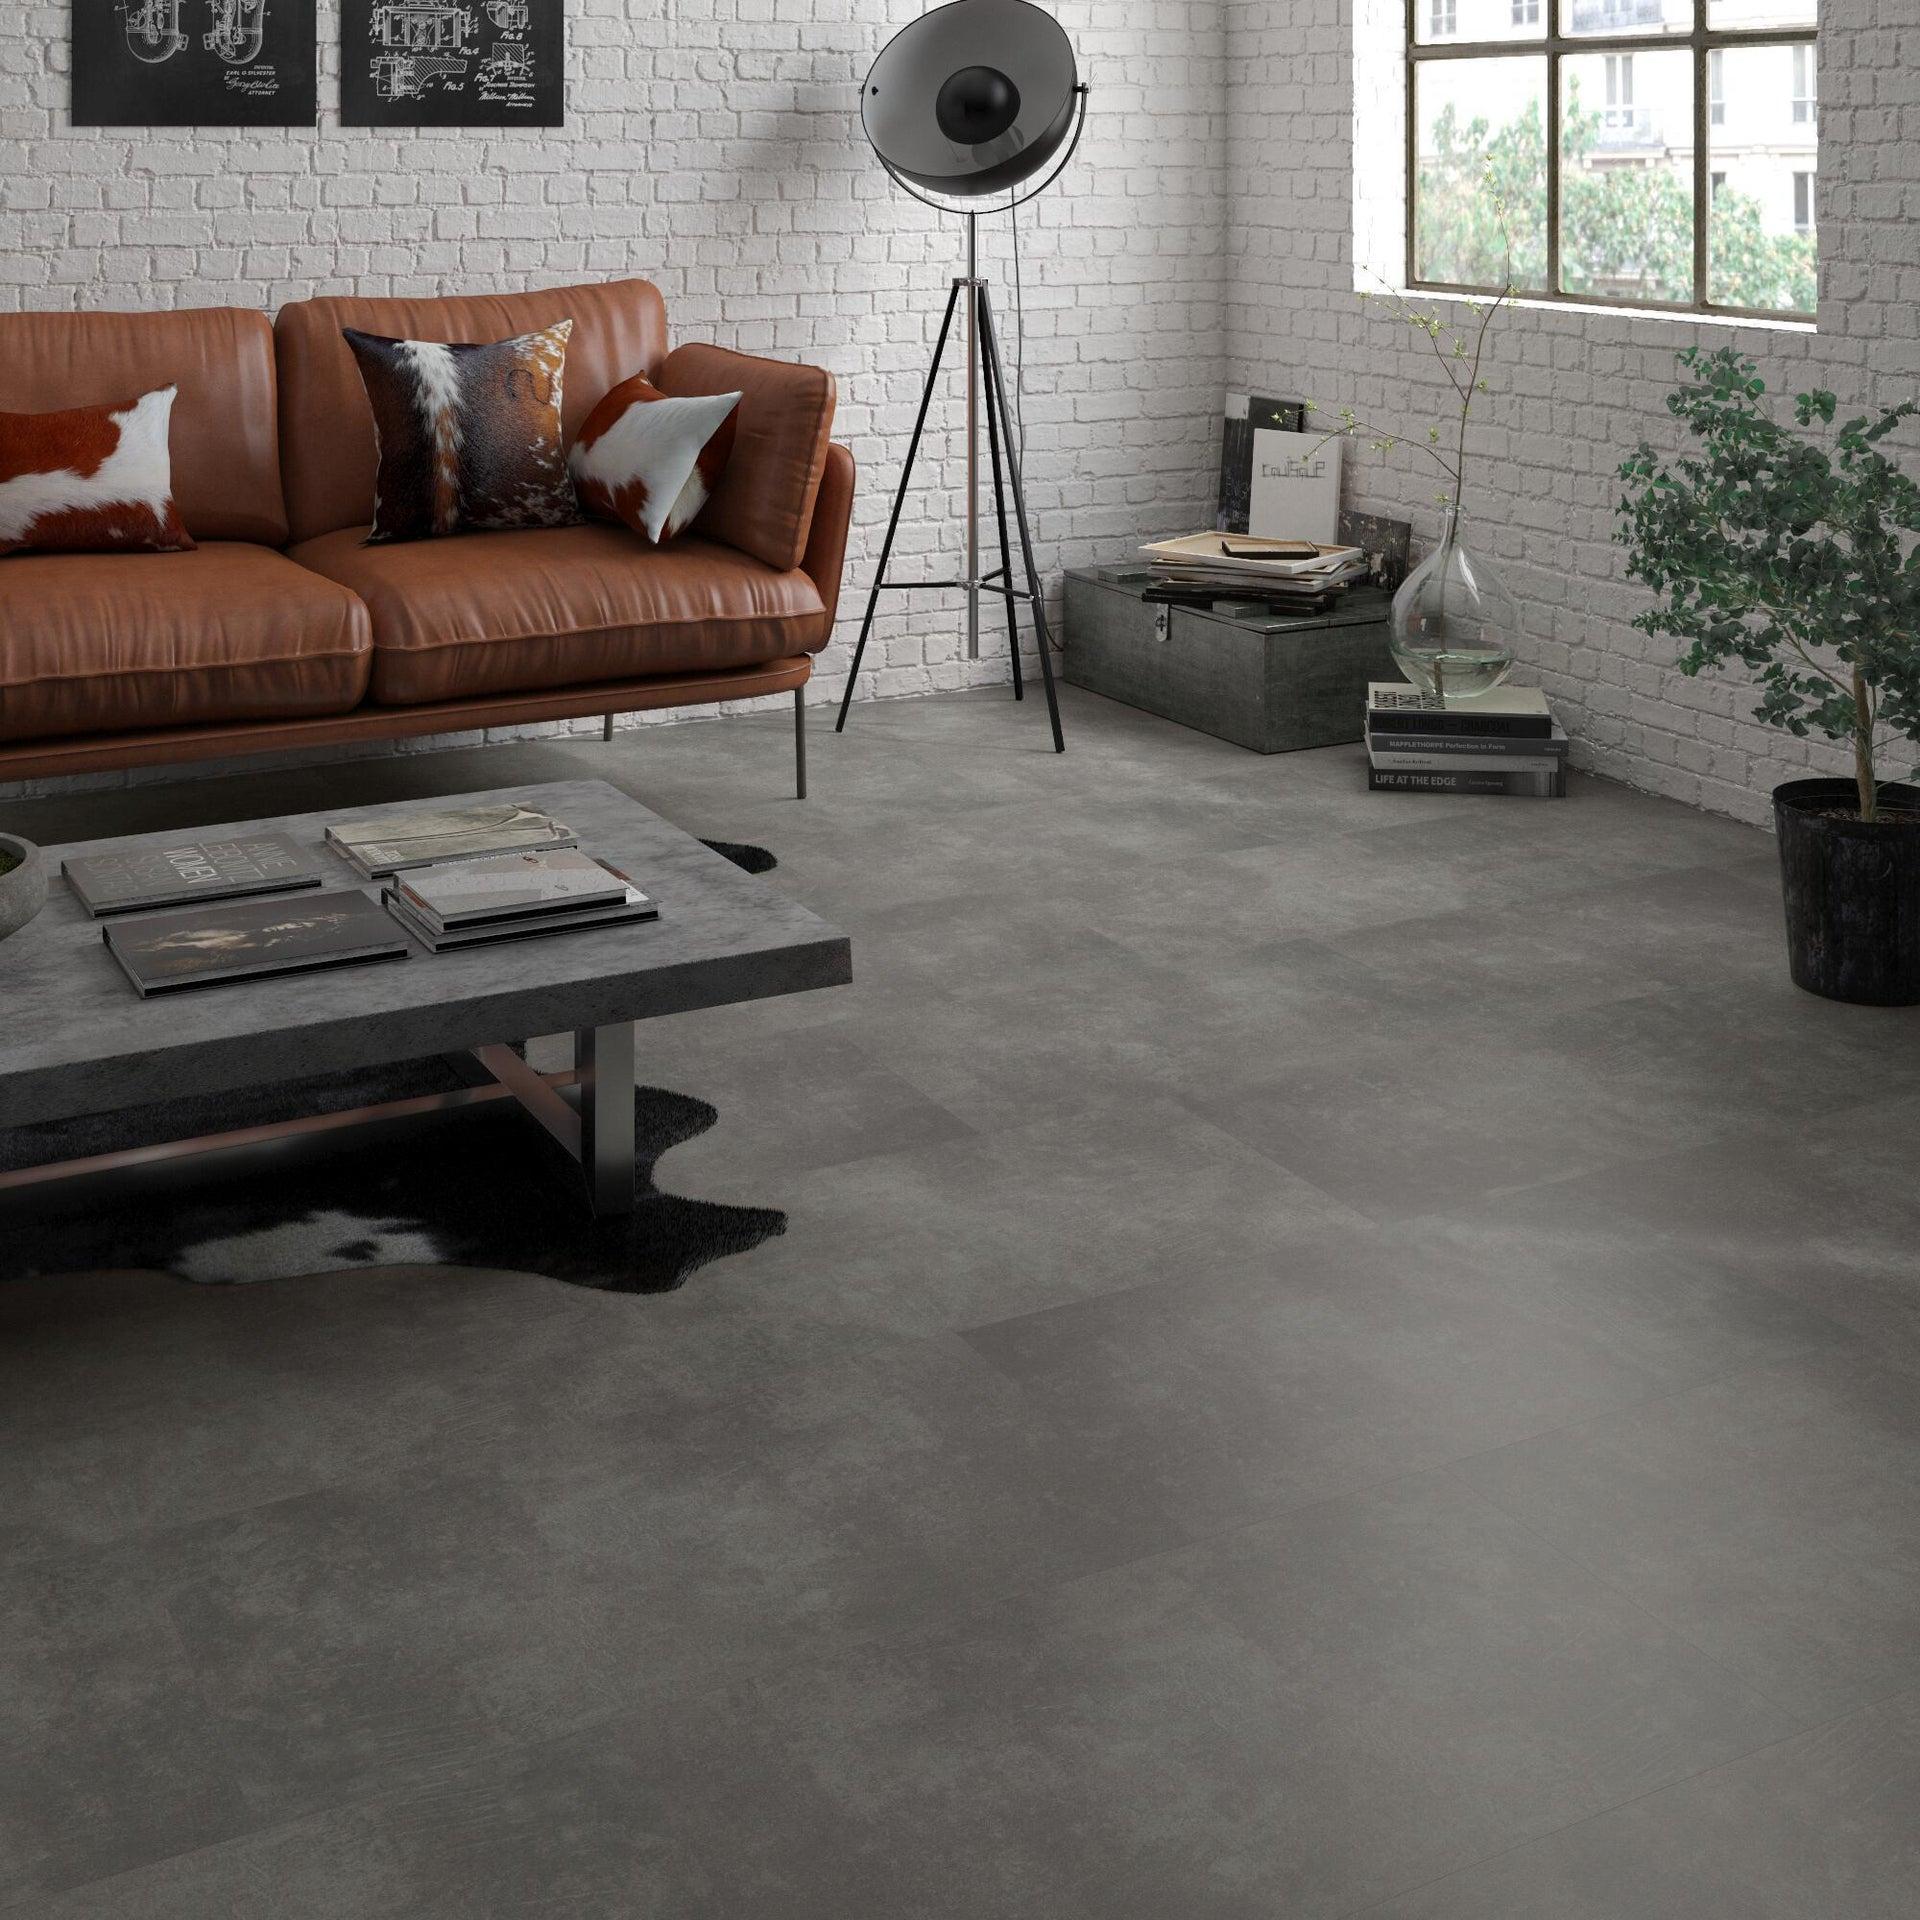 Pavimento PVC incastro Tolu Sp 4 mm grigio / argento - 9